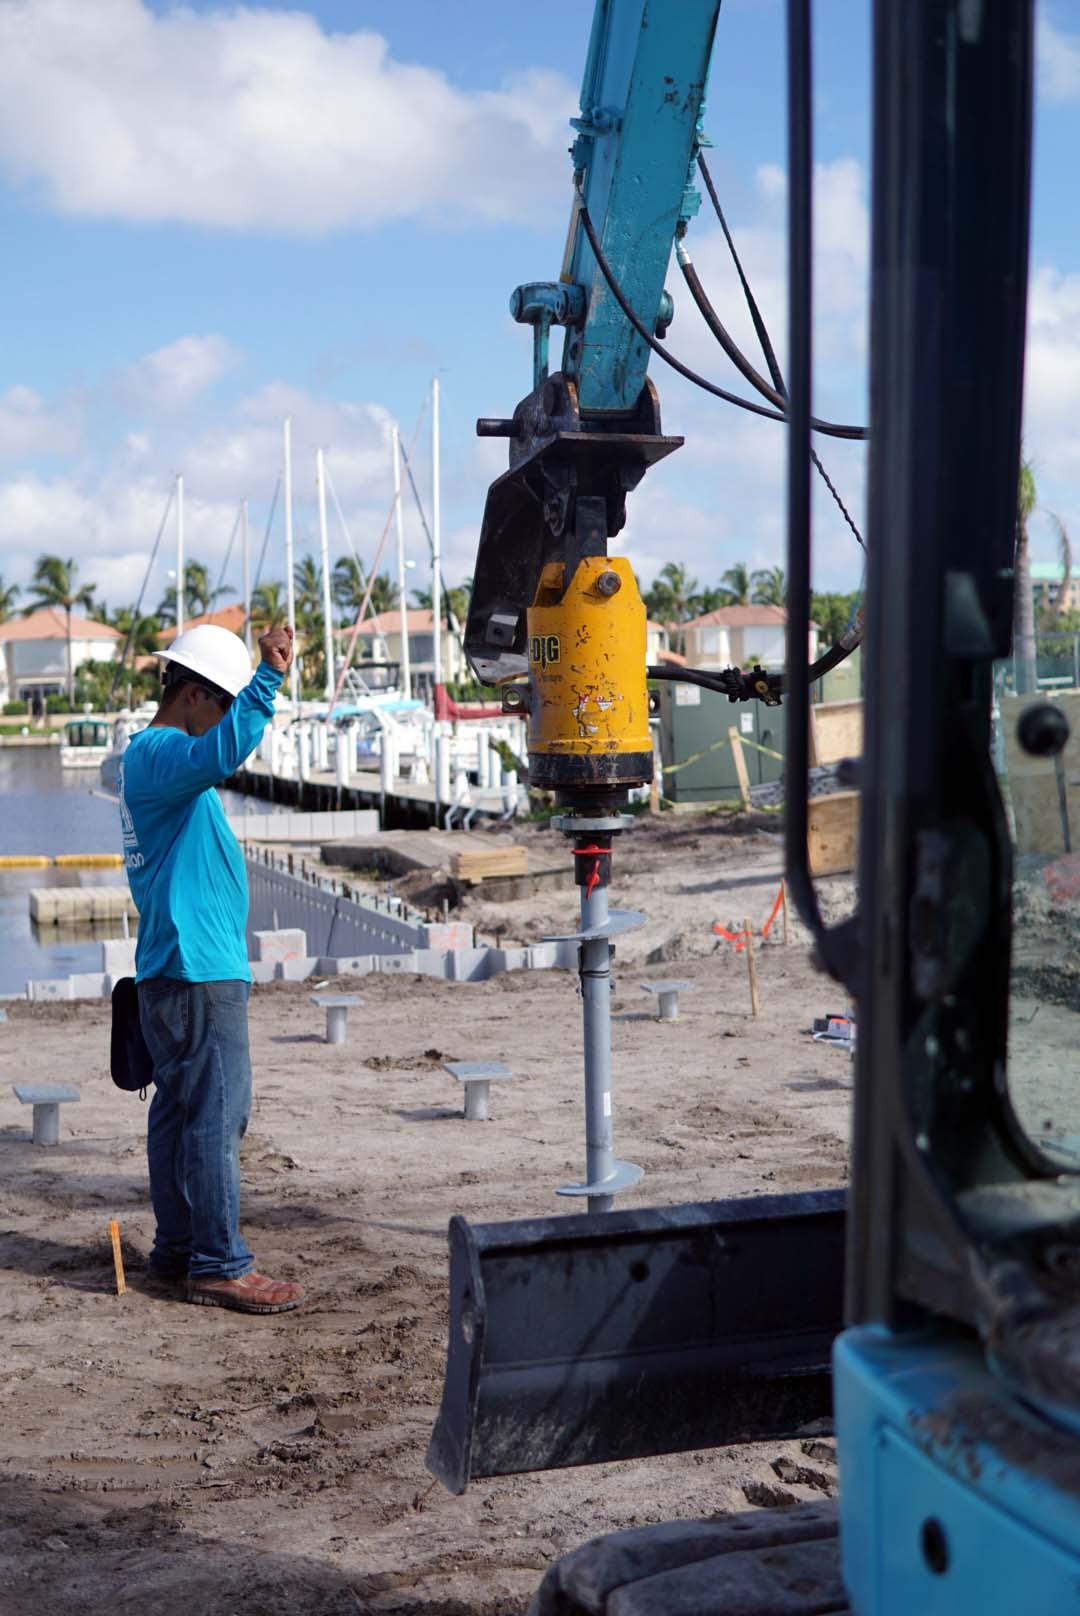 https://coastalfoundationsolutions.com/wp-content/uploads/2019/03/helical-installation.jpg